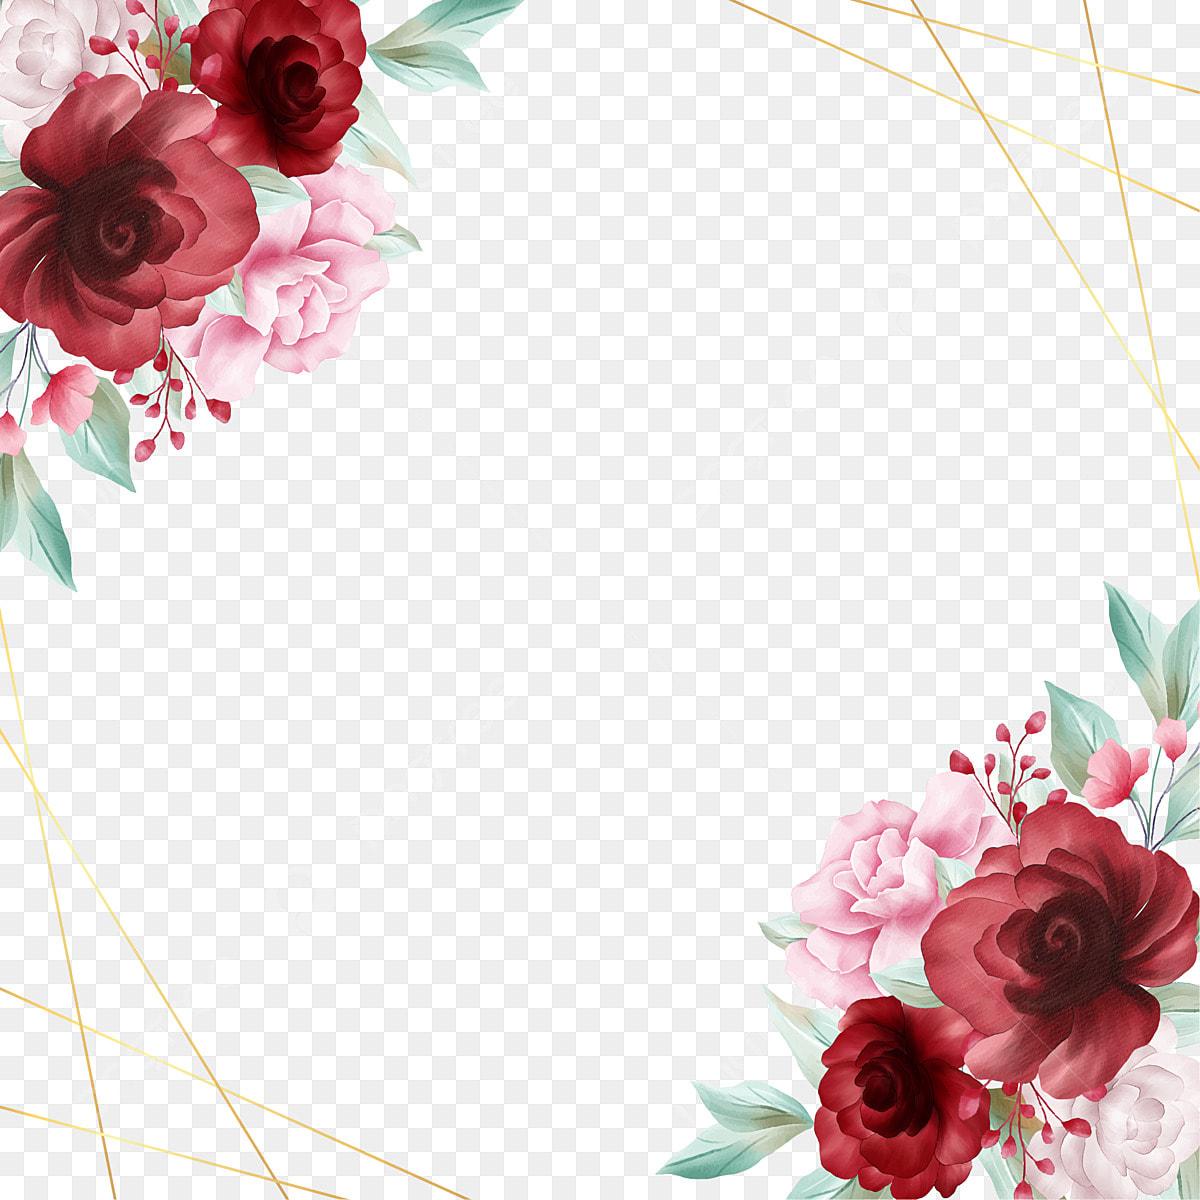 Romantic Watercolor Floral Border With Golden Line Decoration